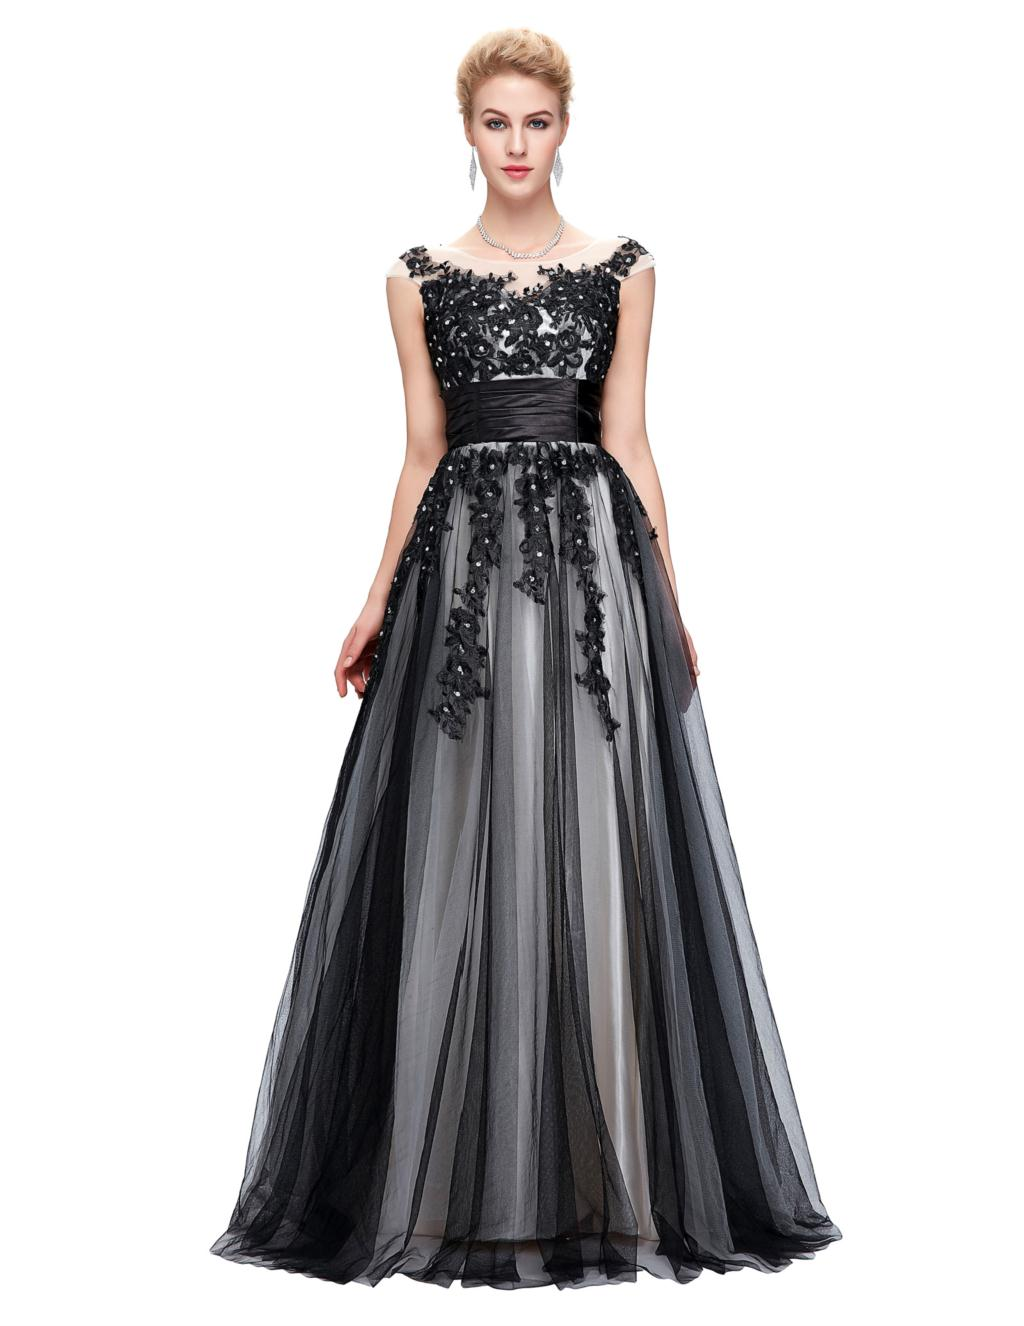 Elegant Lace Appliques Mother of the Bride Dress 3